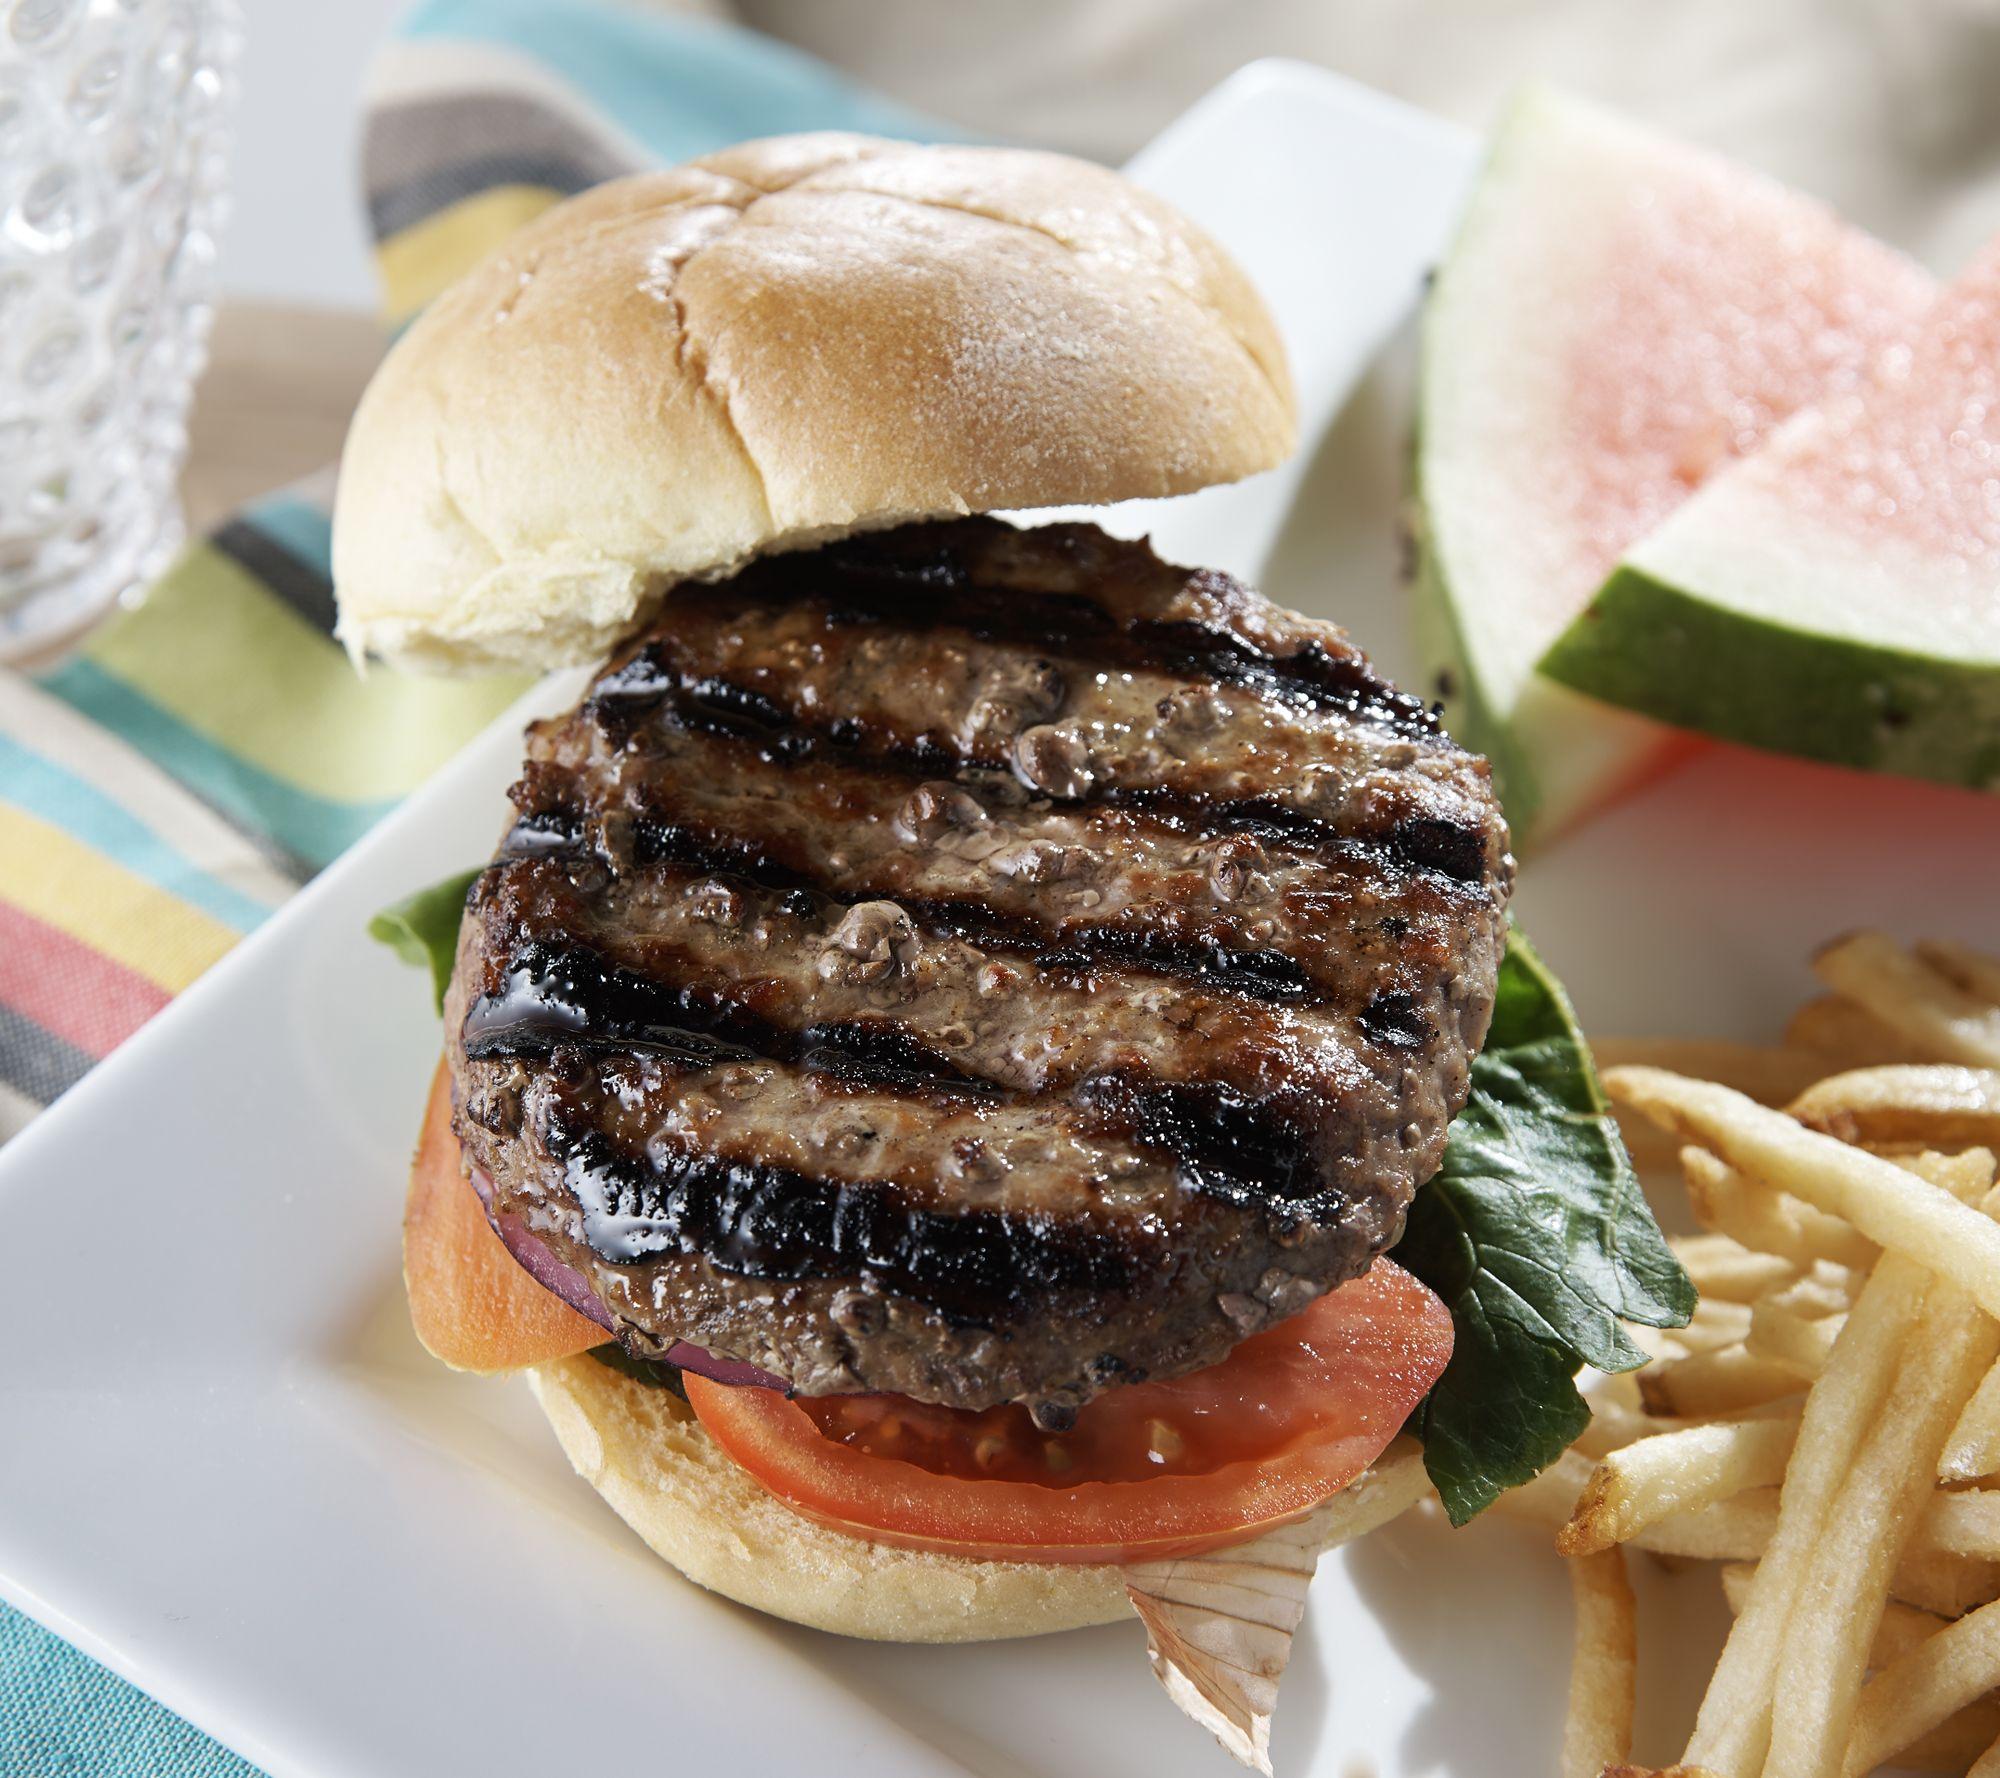 Kansas City Steak Company 12 6 Oz Brisket Burgers Qvc Com